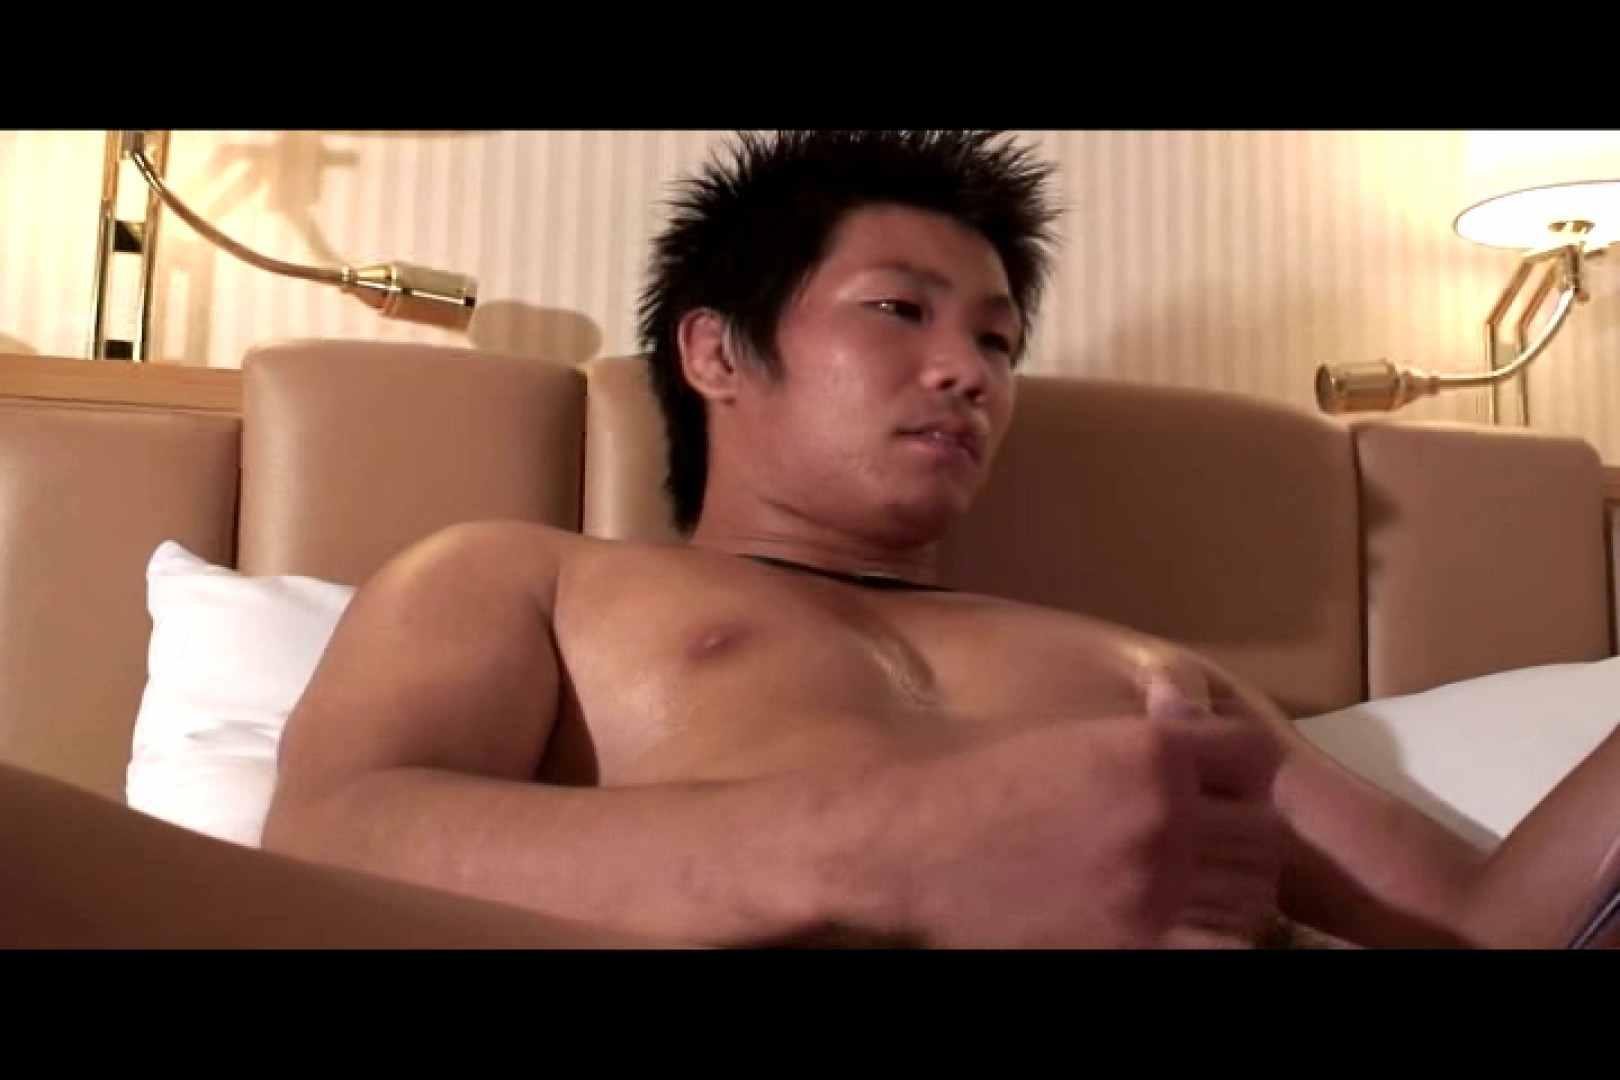 Bistro「イケメン」~Mokkori和風仕立て~vol.03 手コキ AV動画 78枚 14